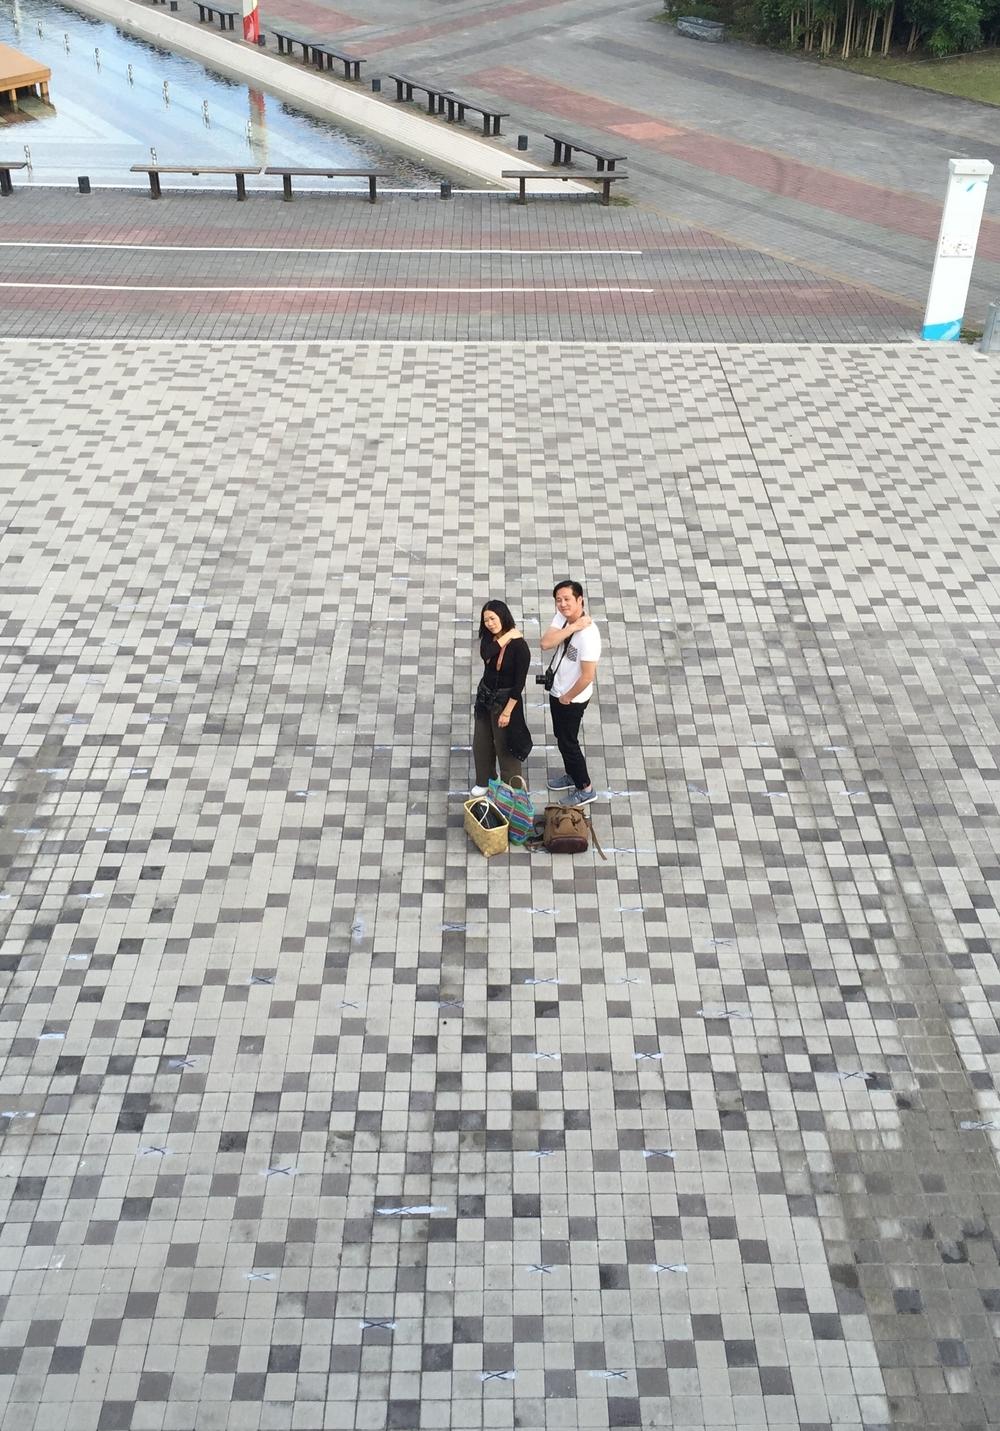 sandy-ley-travel-taipei